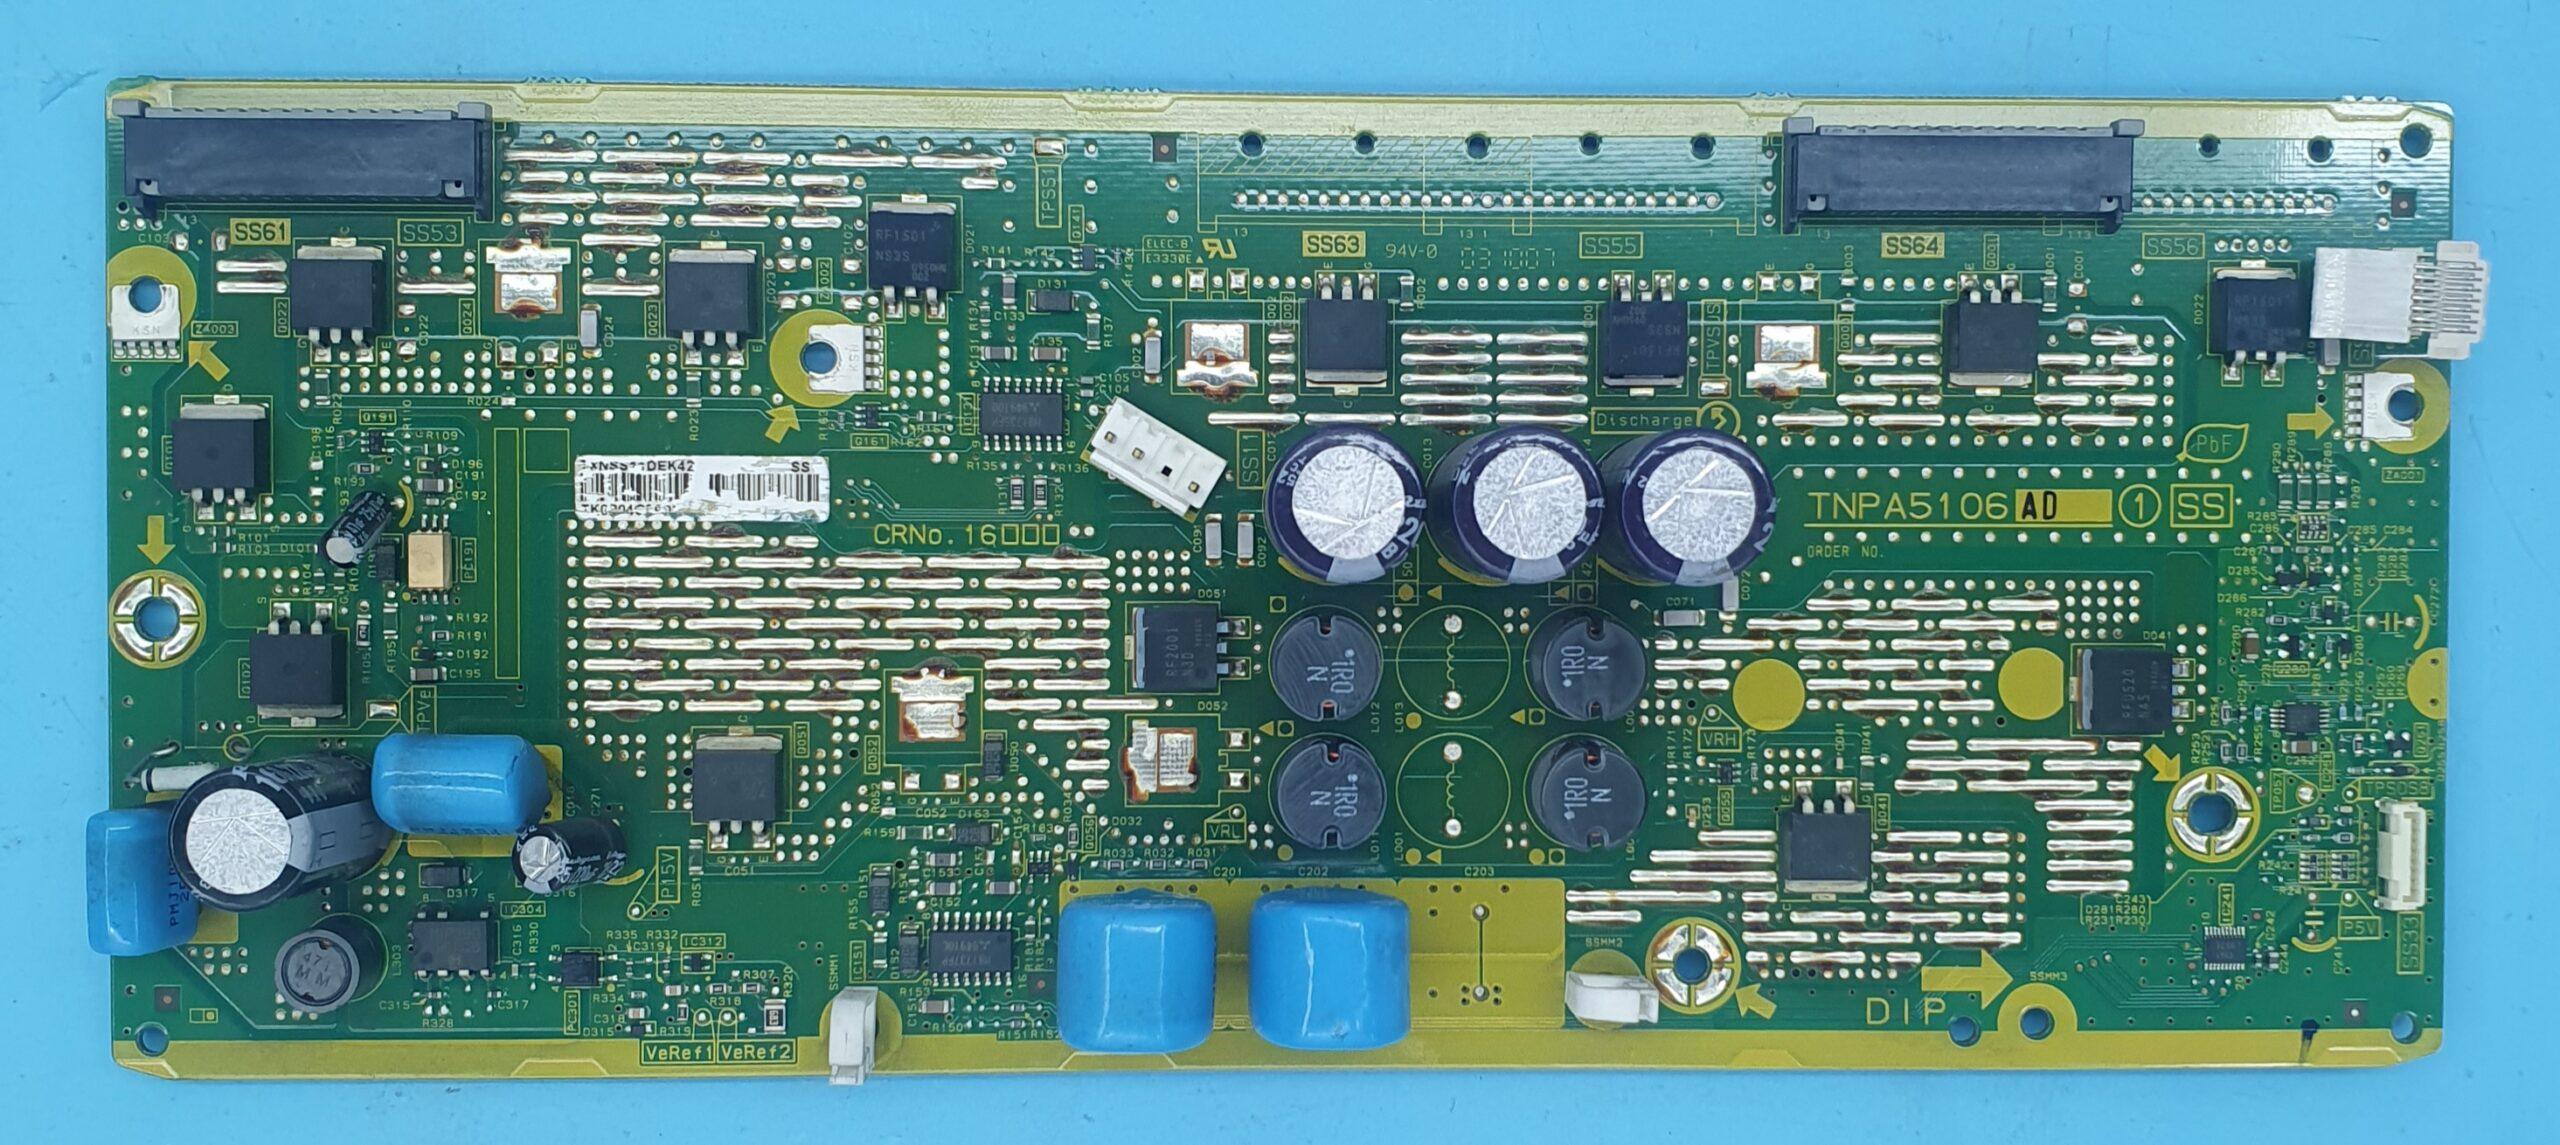 TNPA5106 Panasonic Z-SUS (KDV DAHİL = 130 TL)